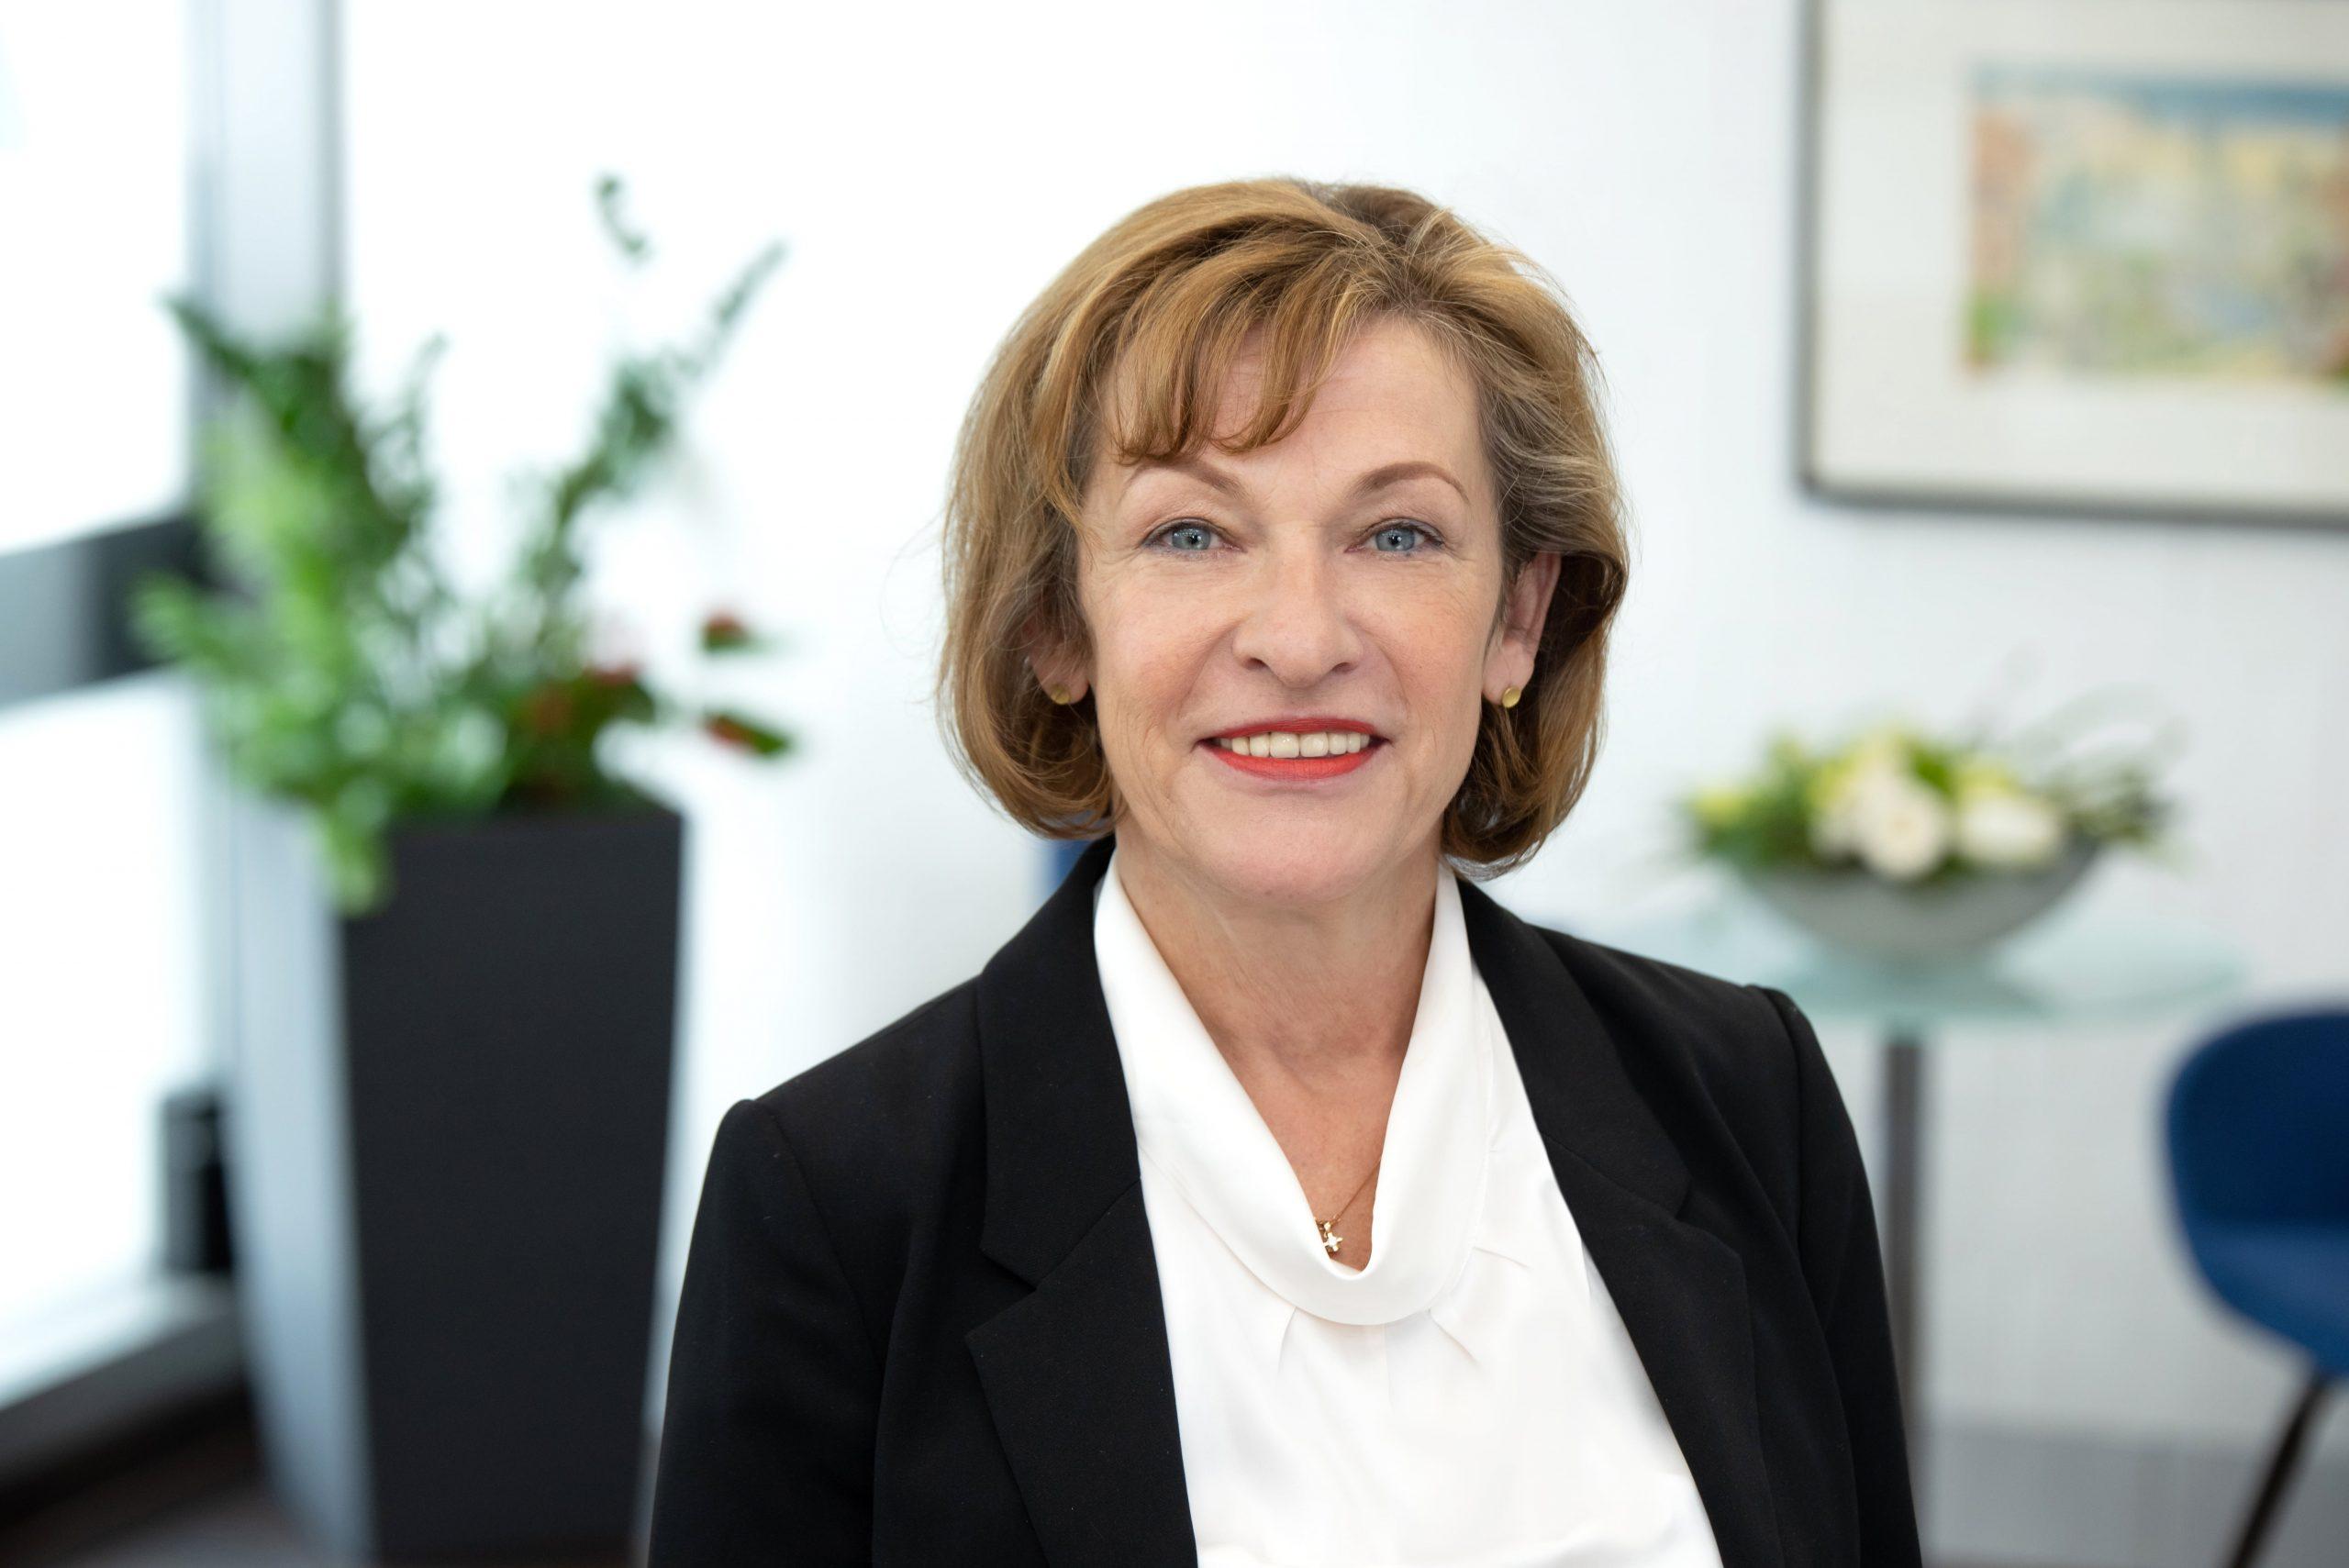 Steffi Retzlaff